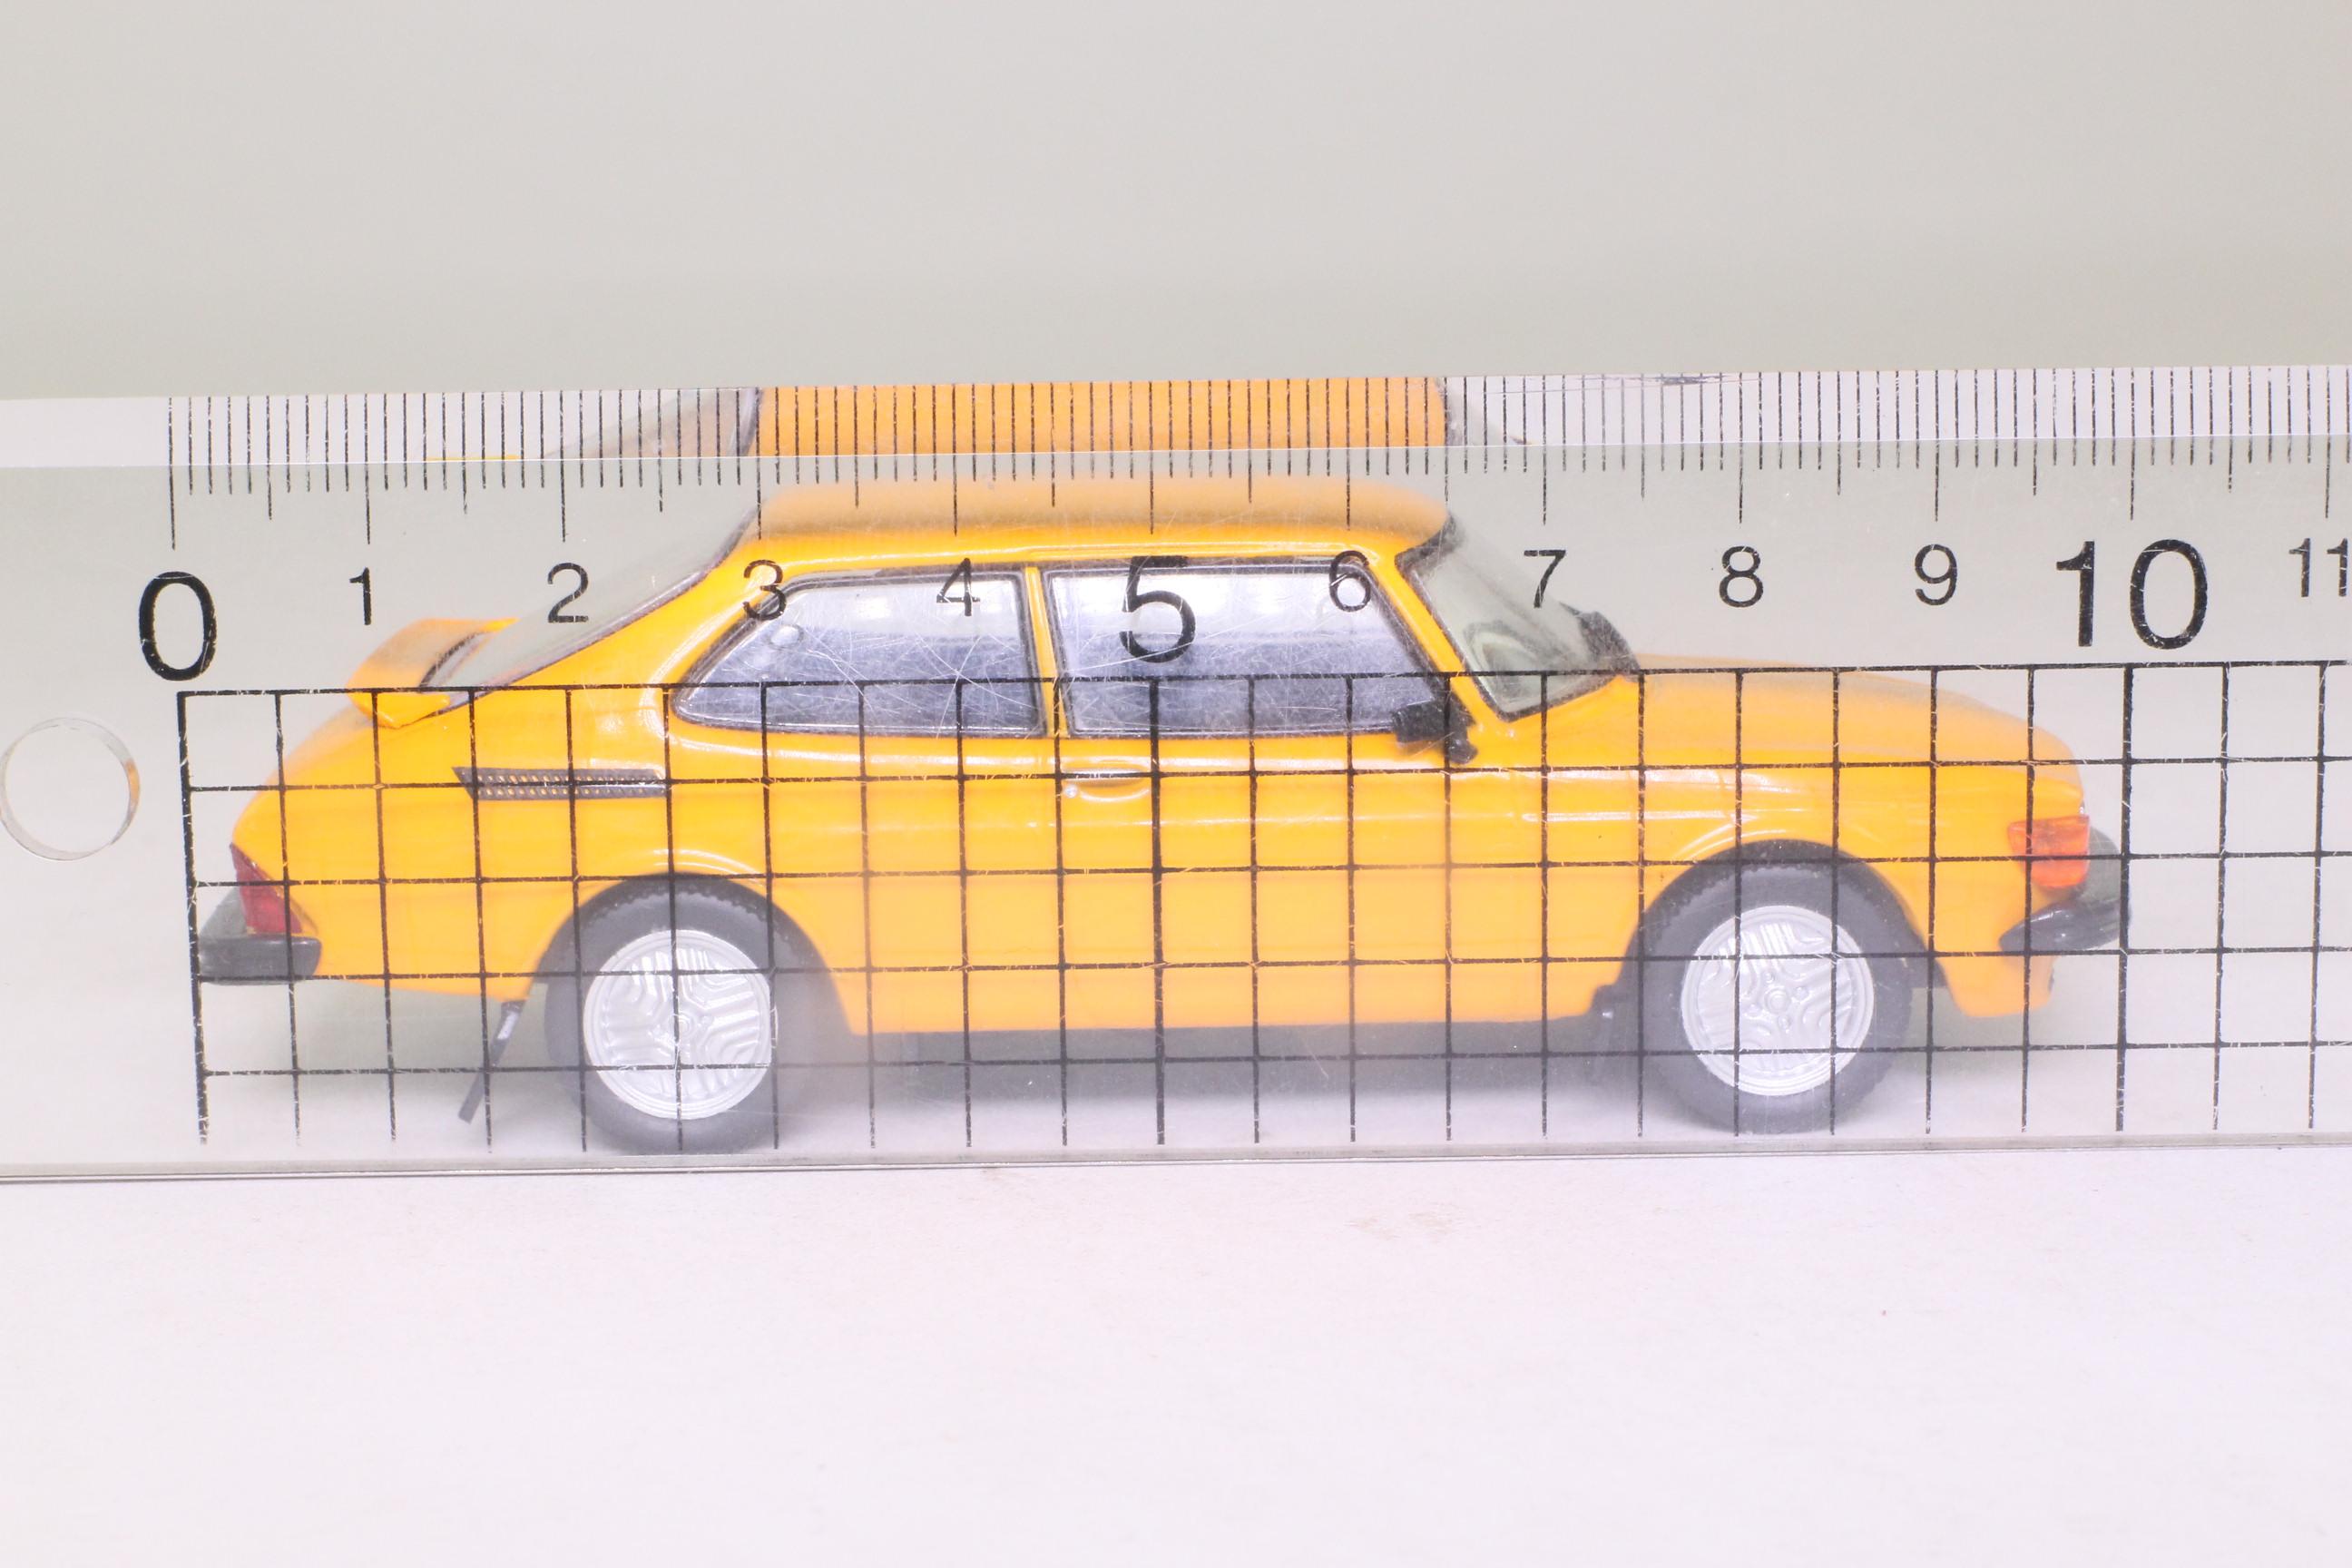 White Box WB122; 1977 Saab 99 Turbo Combi Coupe; Orange